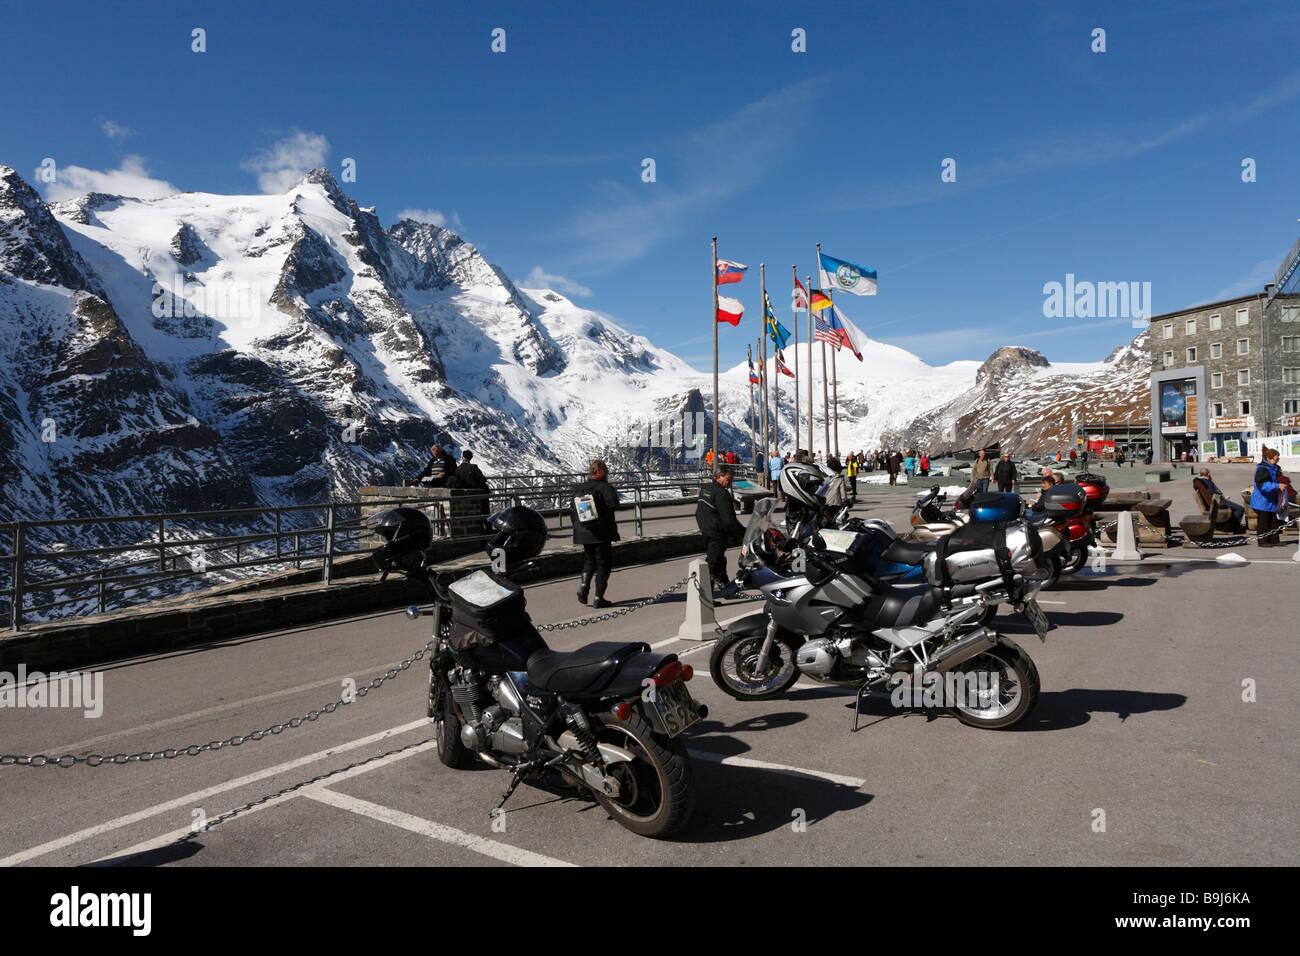 Grossglockner mountain, motorcycles parked at Kaiser-Franz-Josefs-Hoehe, Grossglockner High Alpine Road, Hohe Tauern - Stock Image